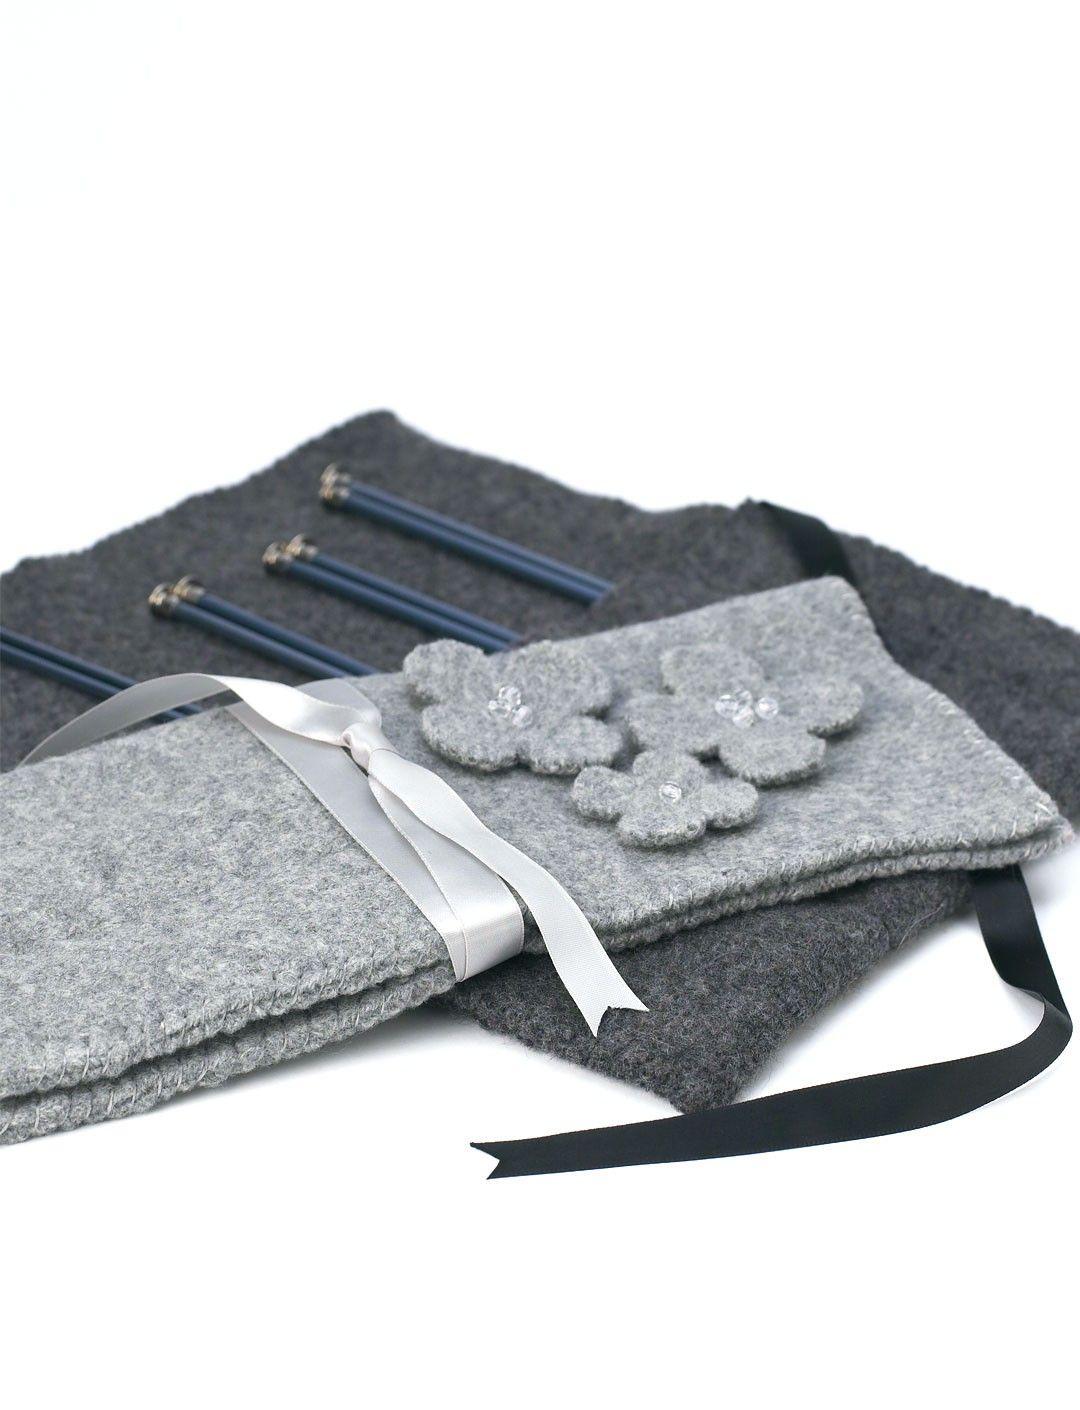 Yarnspirations.com - Patons Felted Knitting Needle Case - Patterns ...